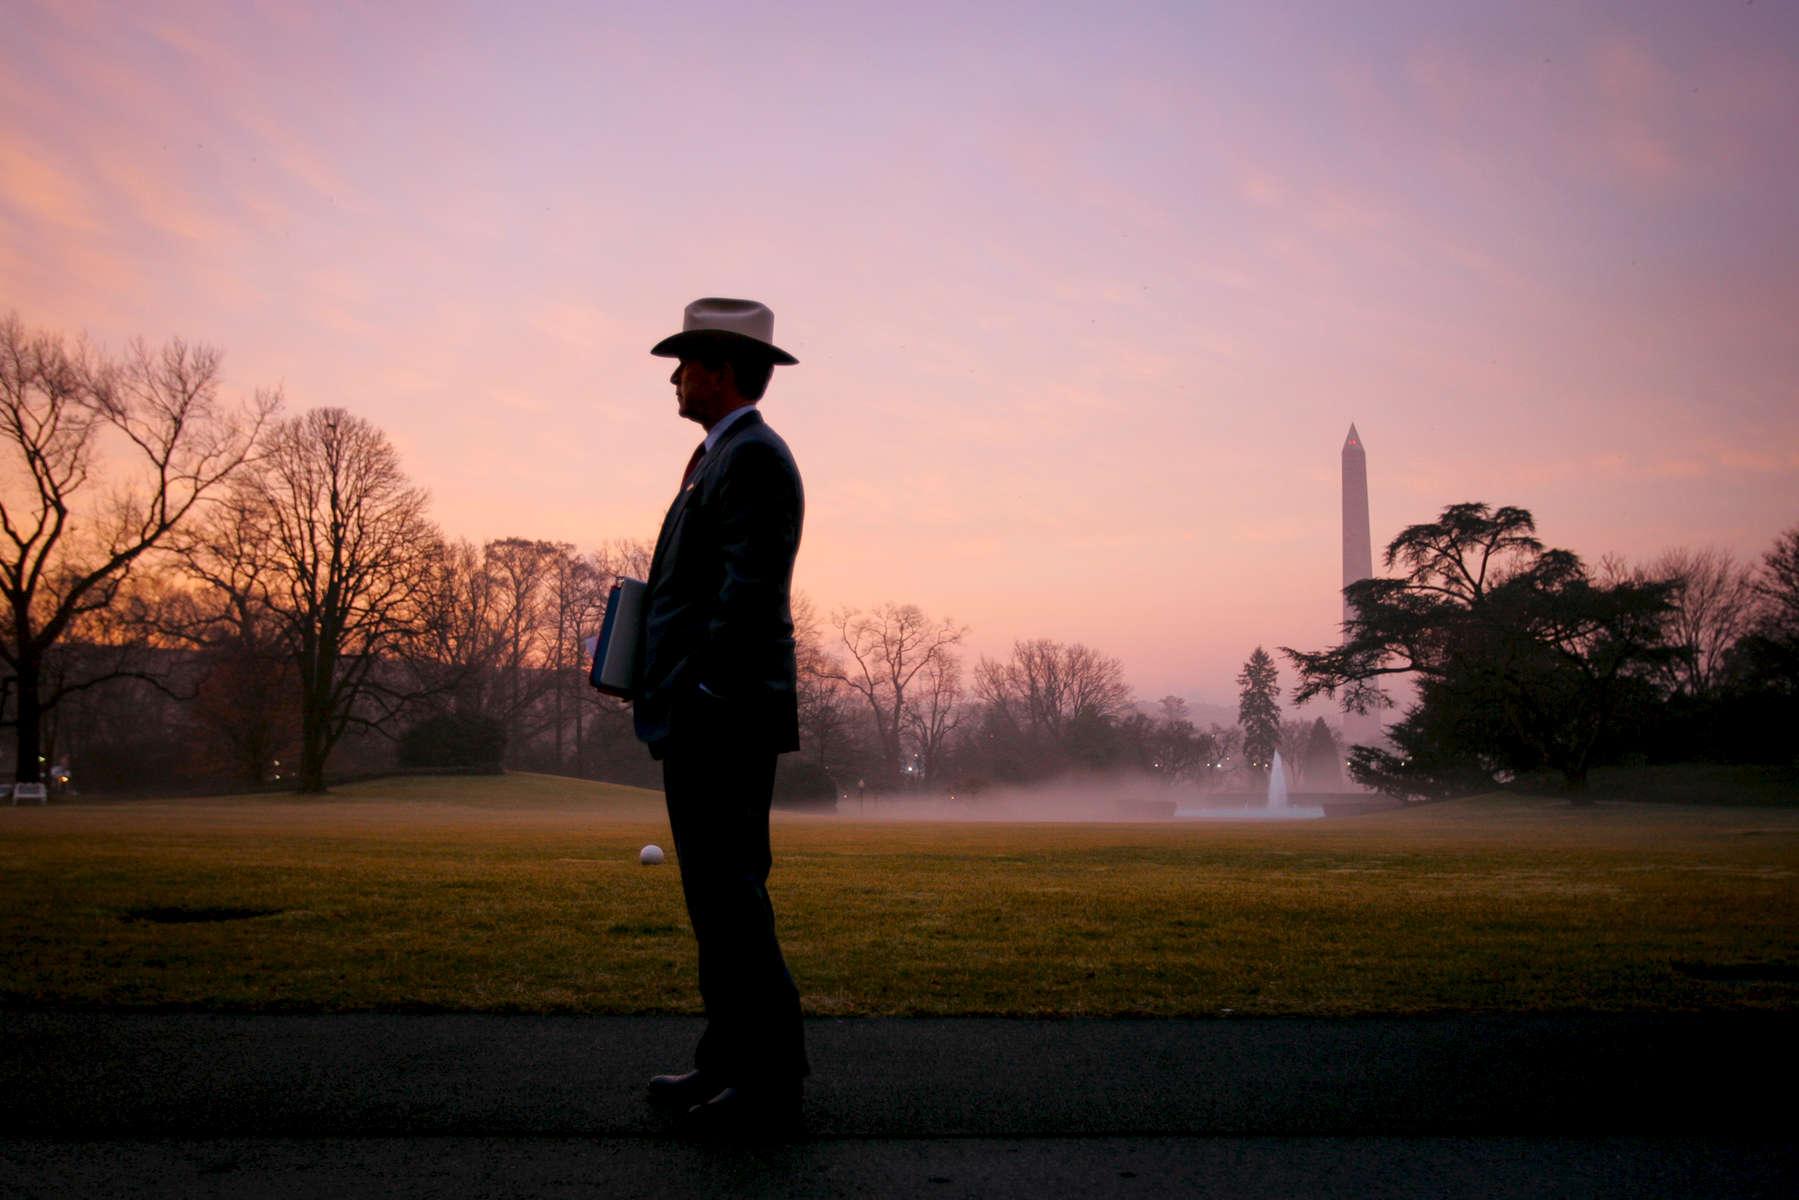 President Bush en route to the Oval Office. South Lawn. Sunrise. Cowboy hat.Bush Family Scrapbook